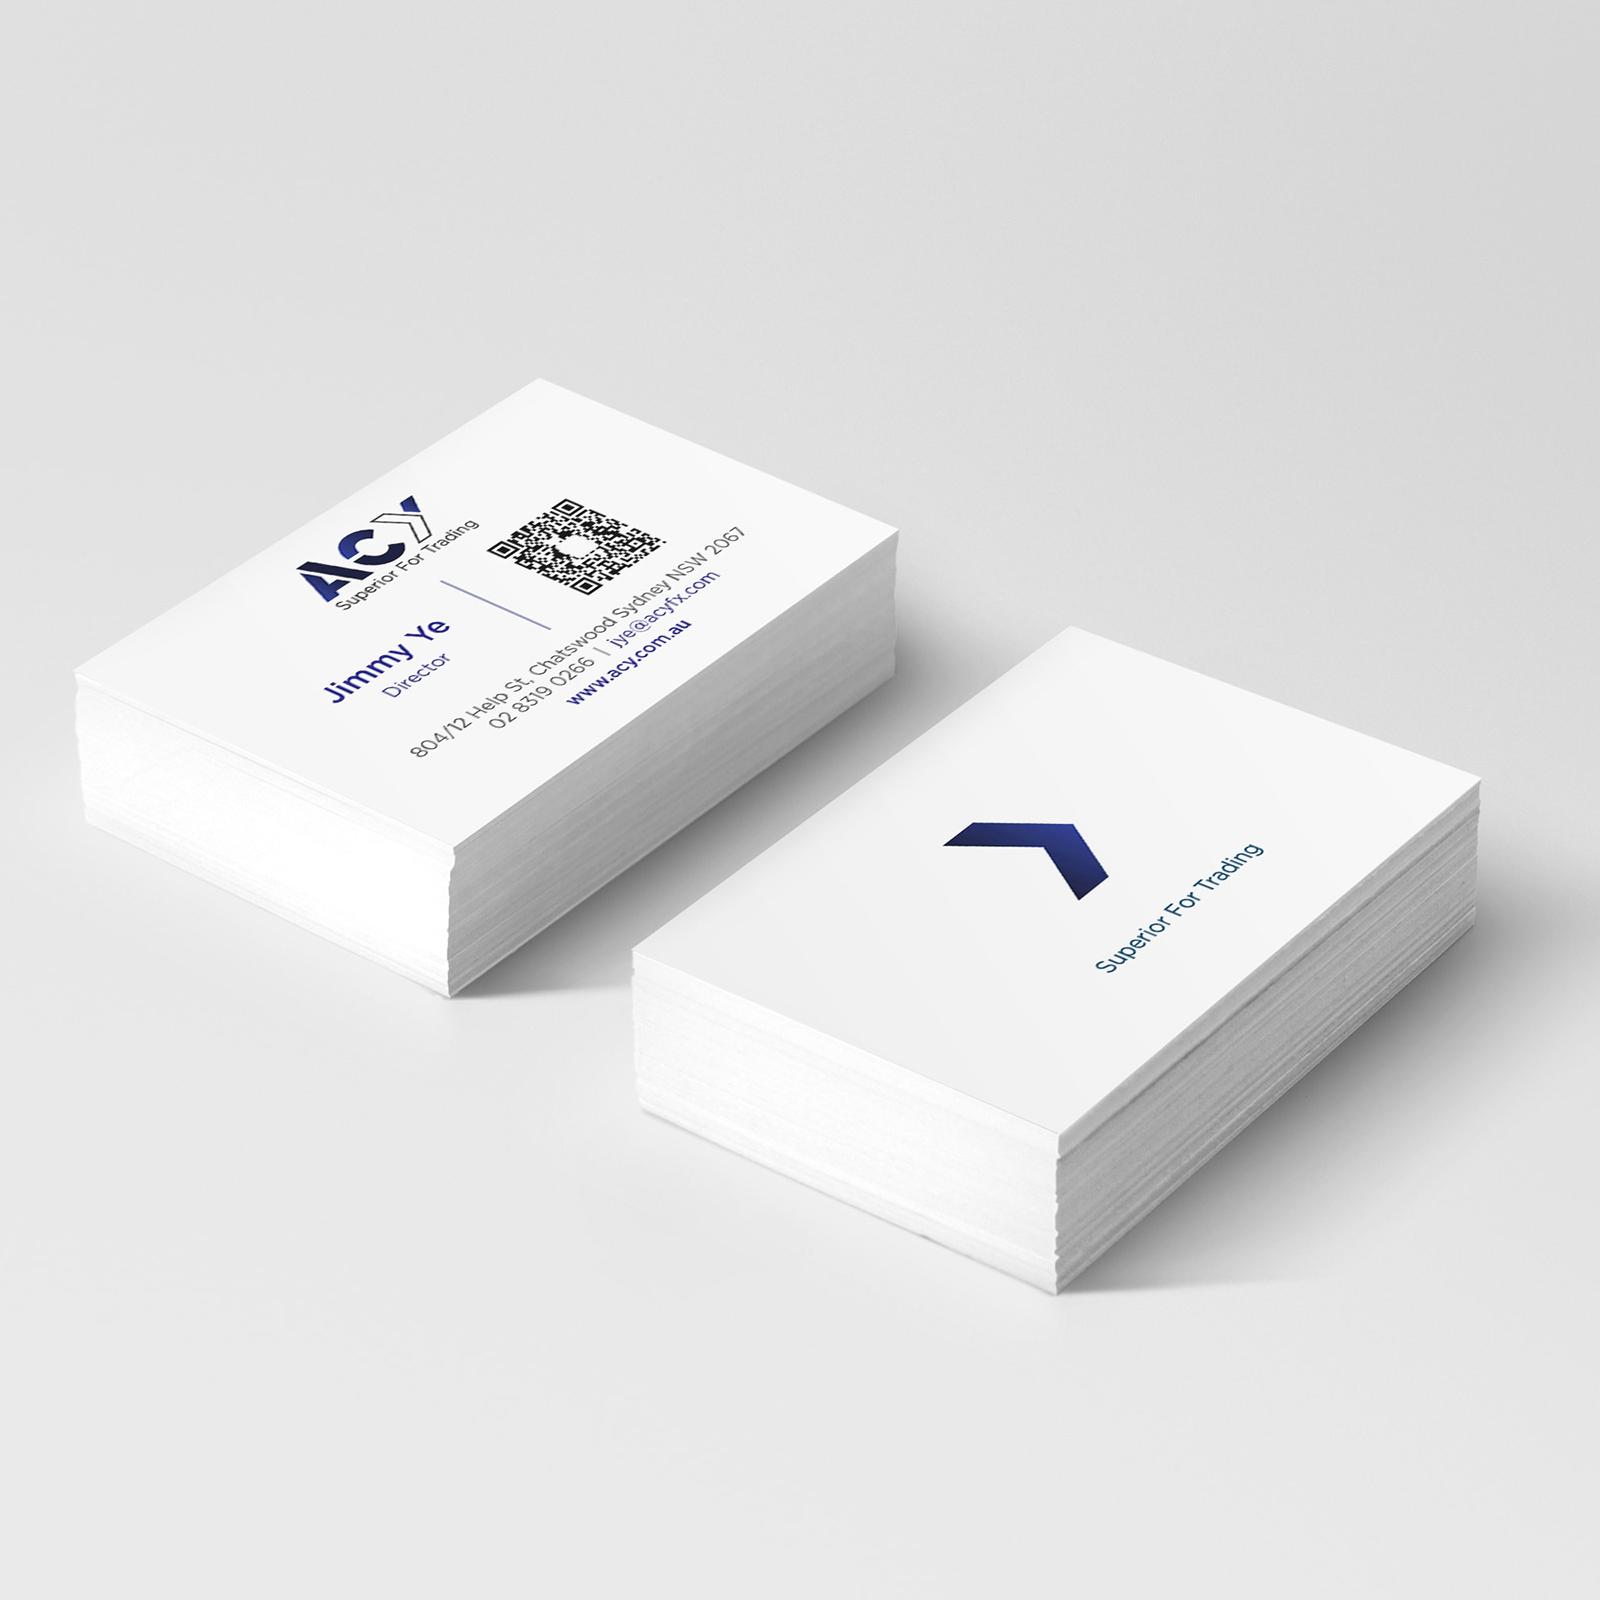 all-in-one_Branding-Identitny-Mockup-25-min